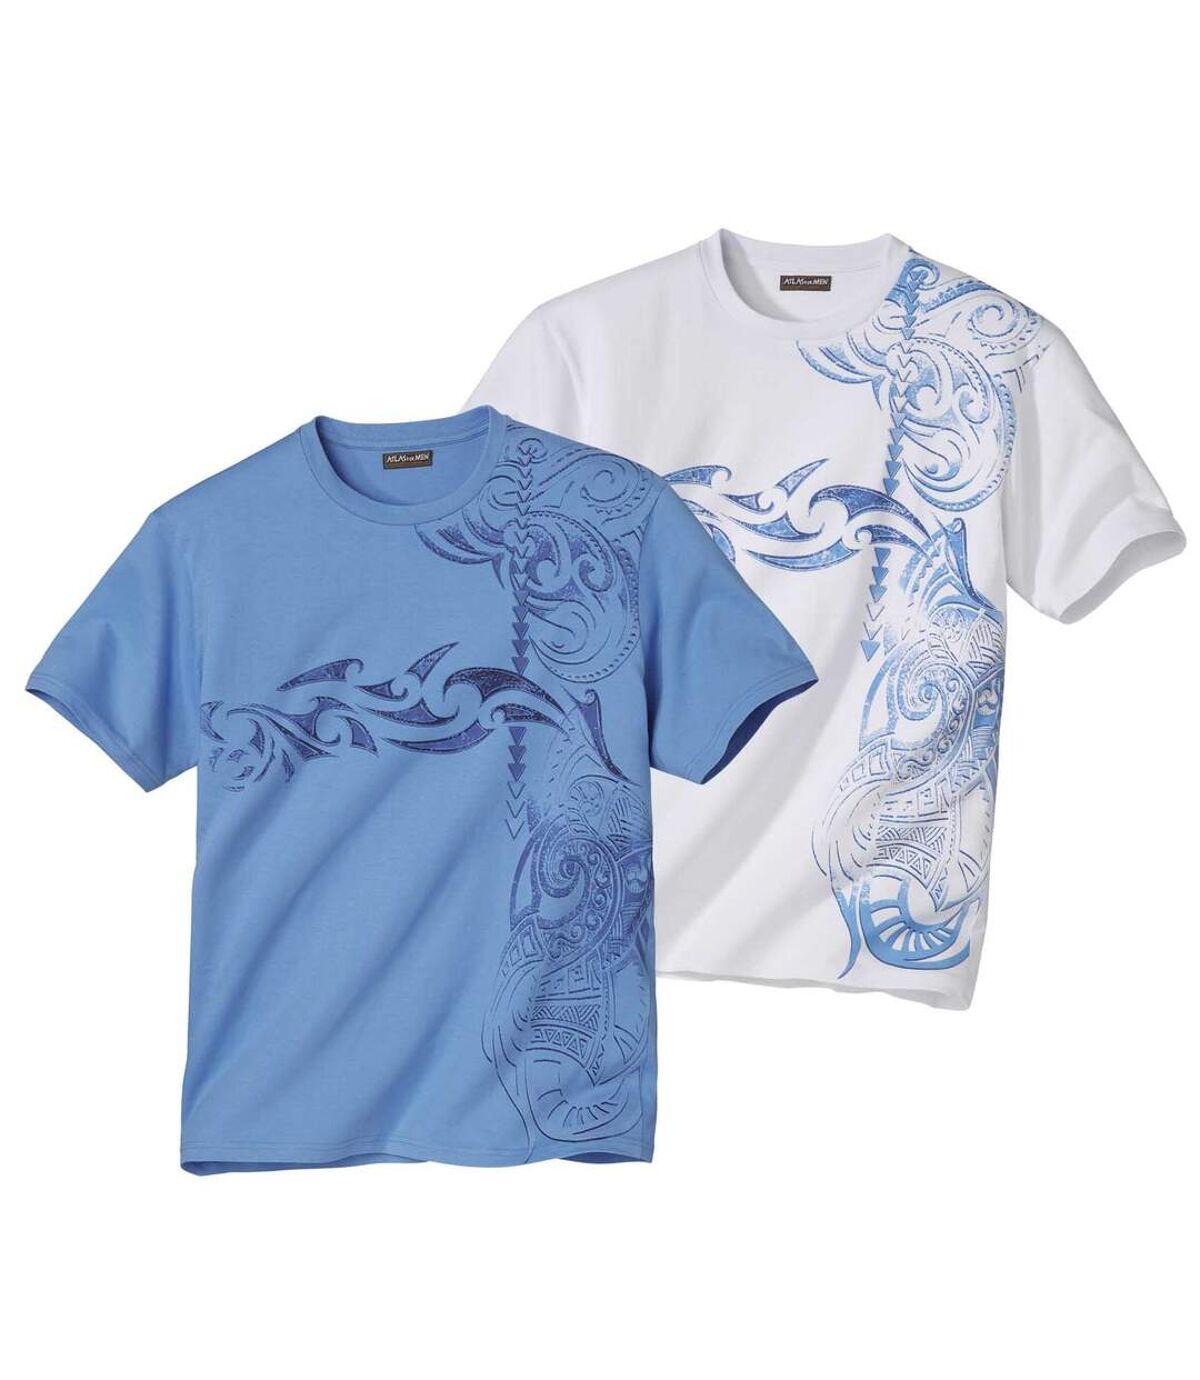 Zestaw 2 t-shirtów Maori Tatoo Atlas For Men